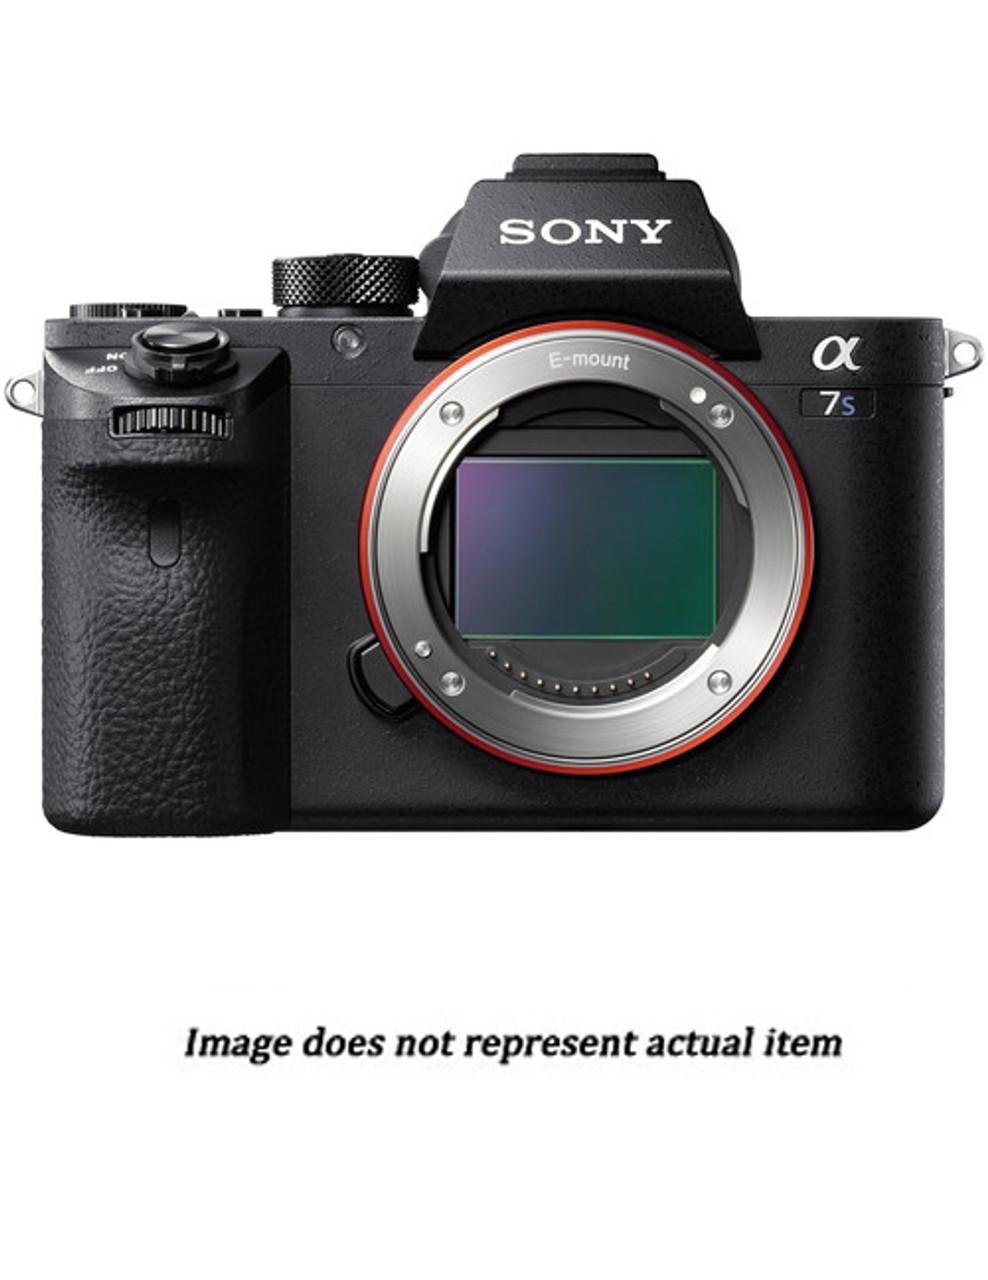 Sony Alpha a7S II Mirrorless Digital Camera Body (USED) - S/N 3392320